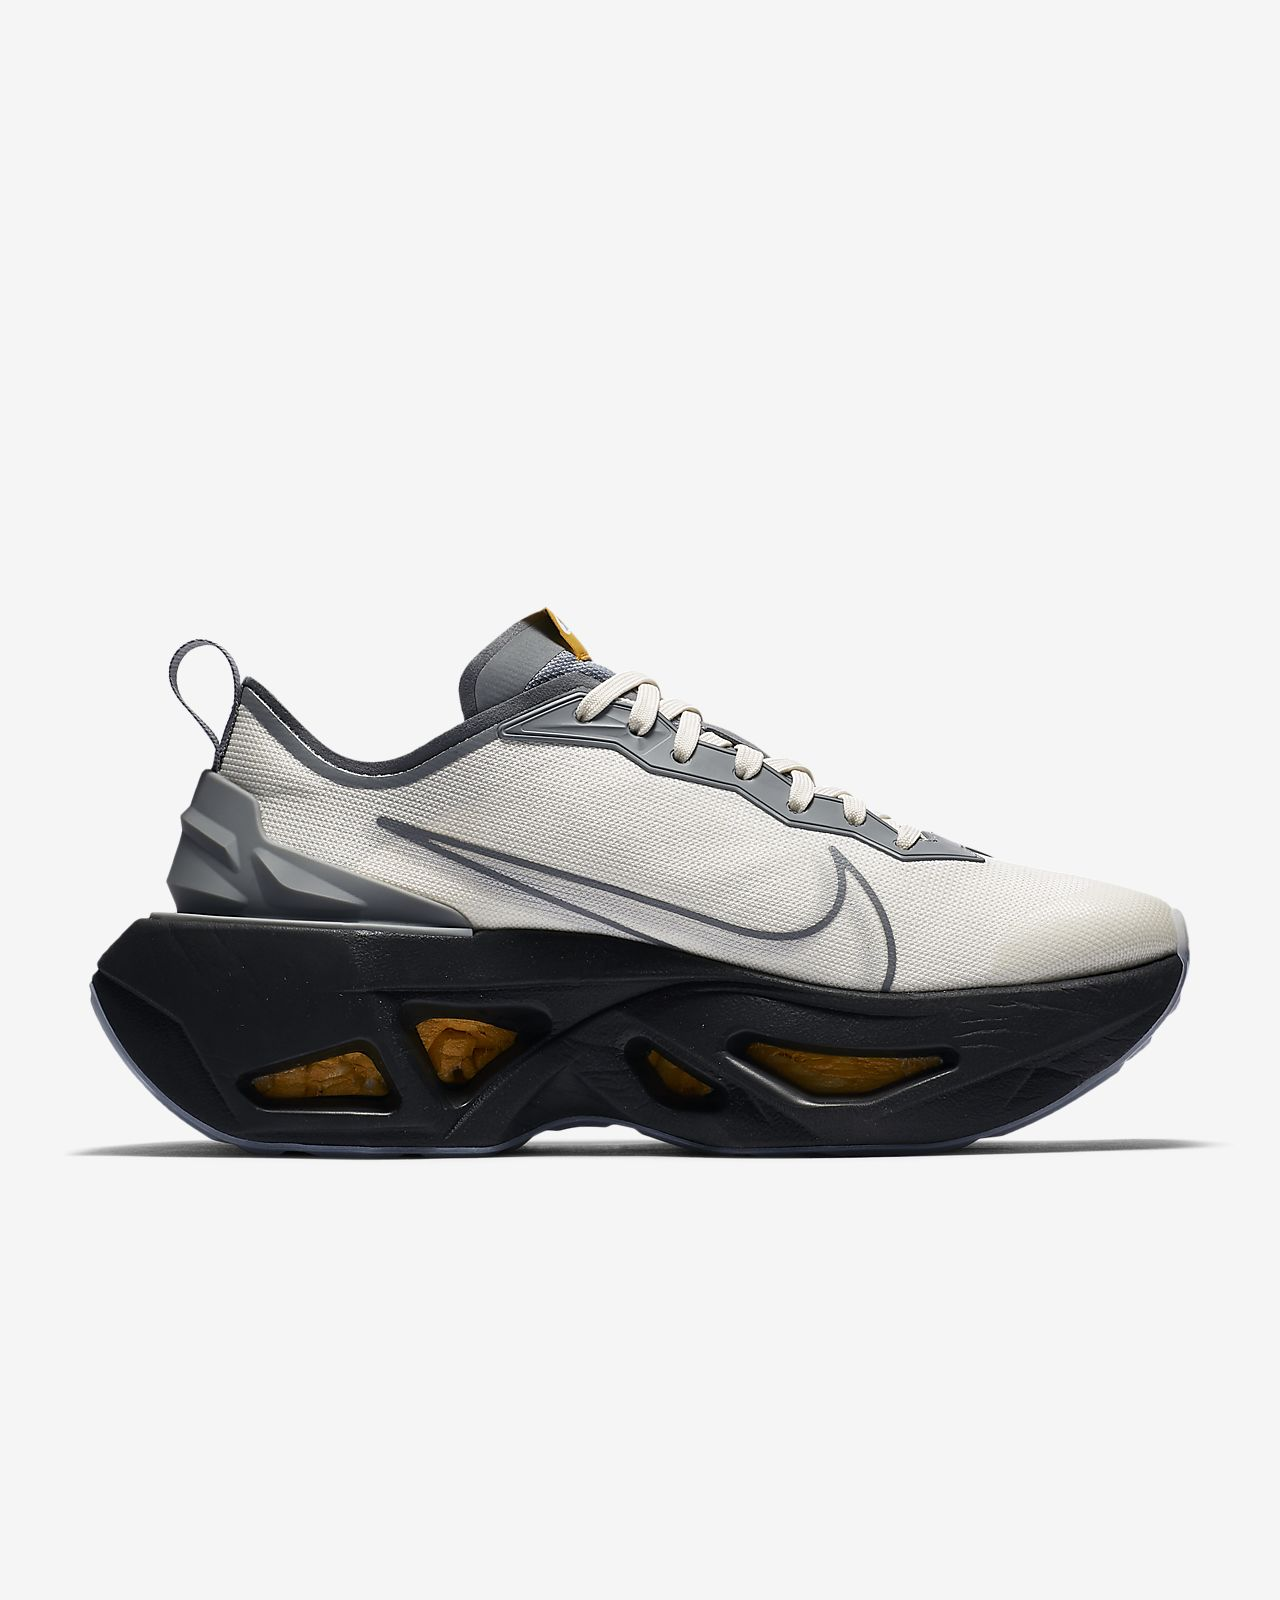 nike sb sko til, Nike Free Run Sort Fersken Kvinder Sko,nike